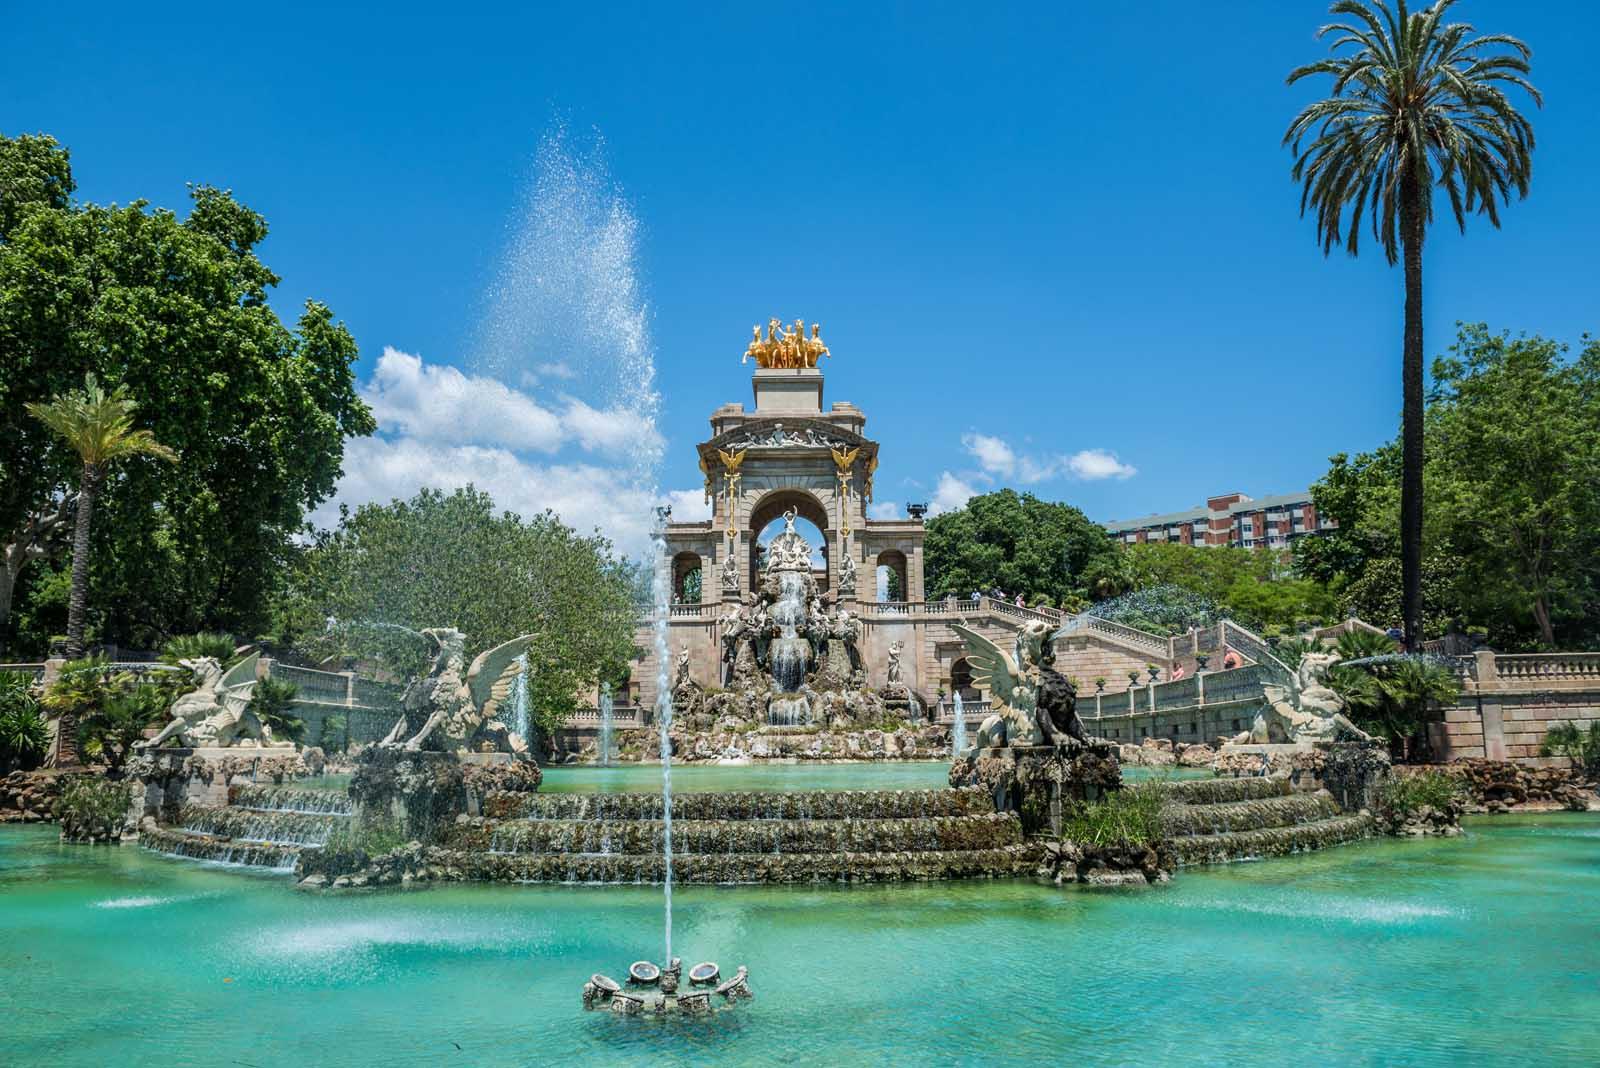 Casacada Fountain in Barcelona